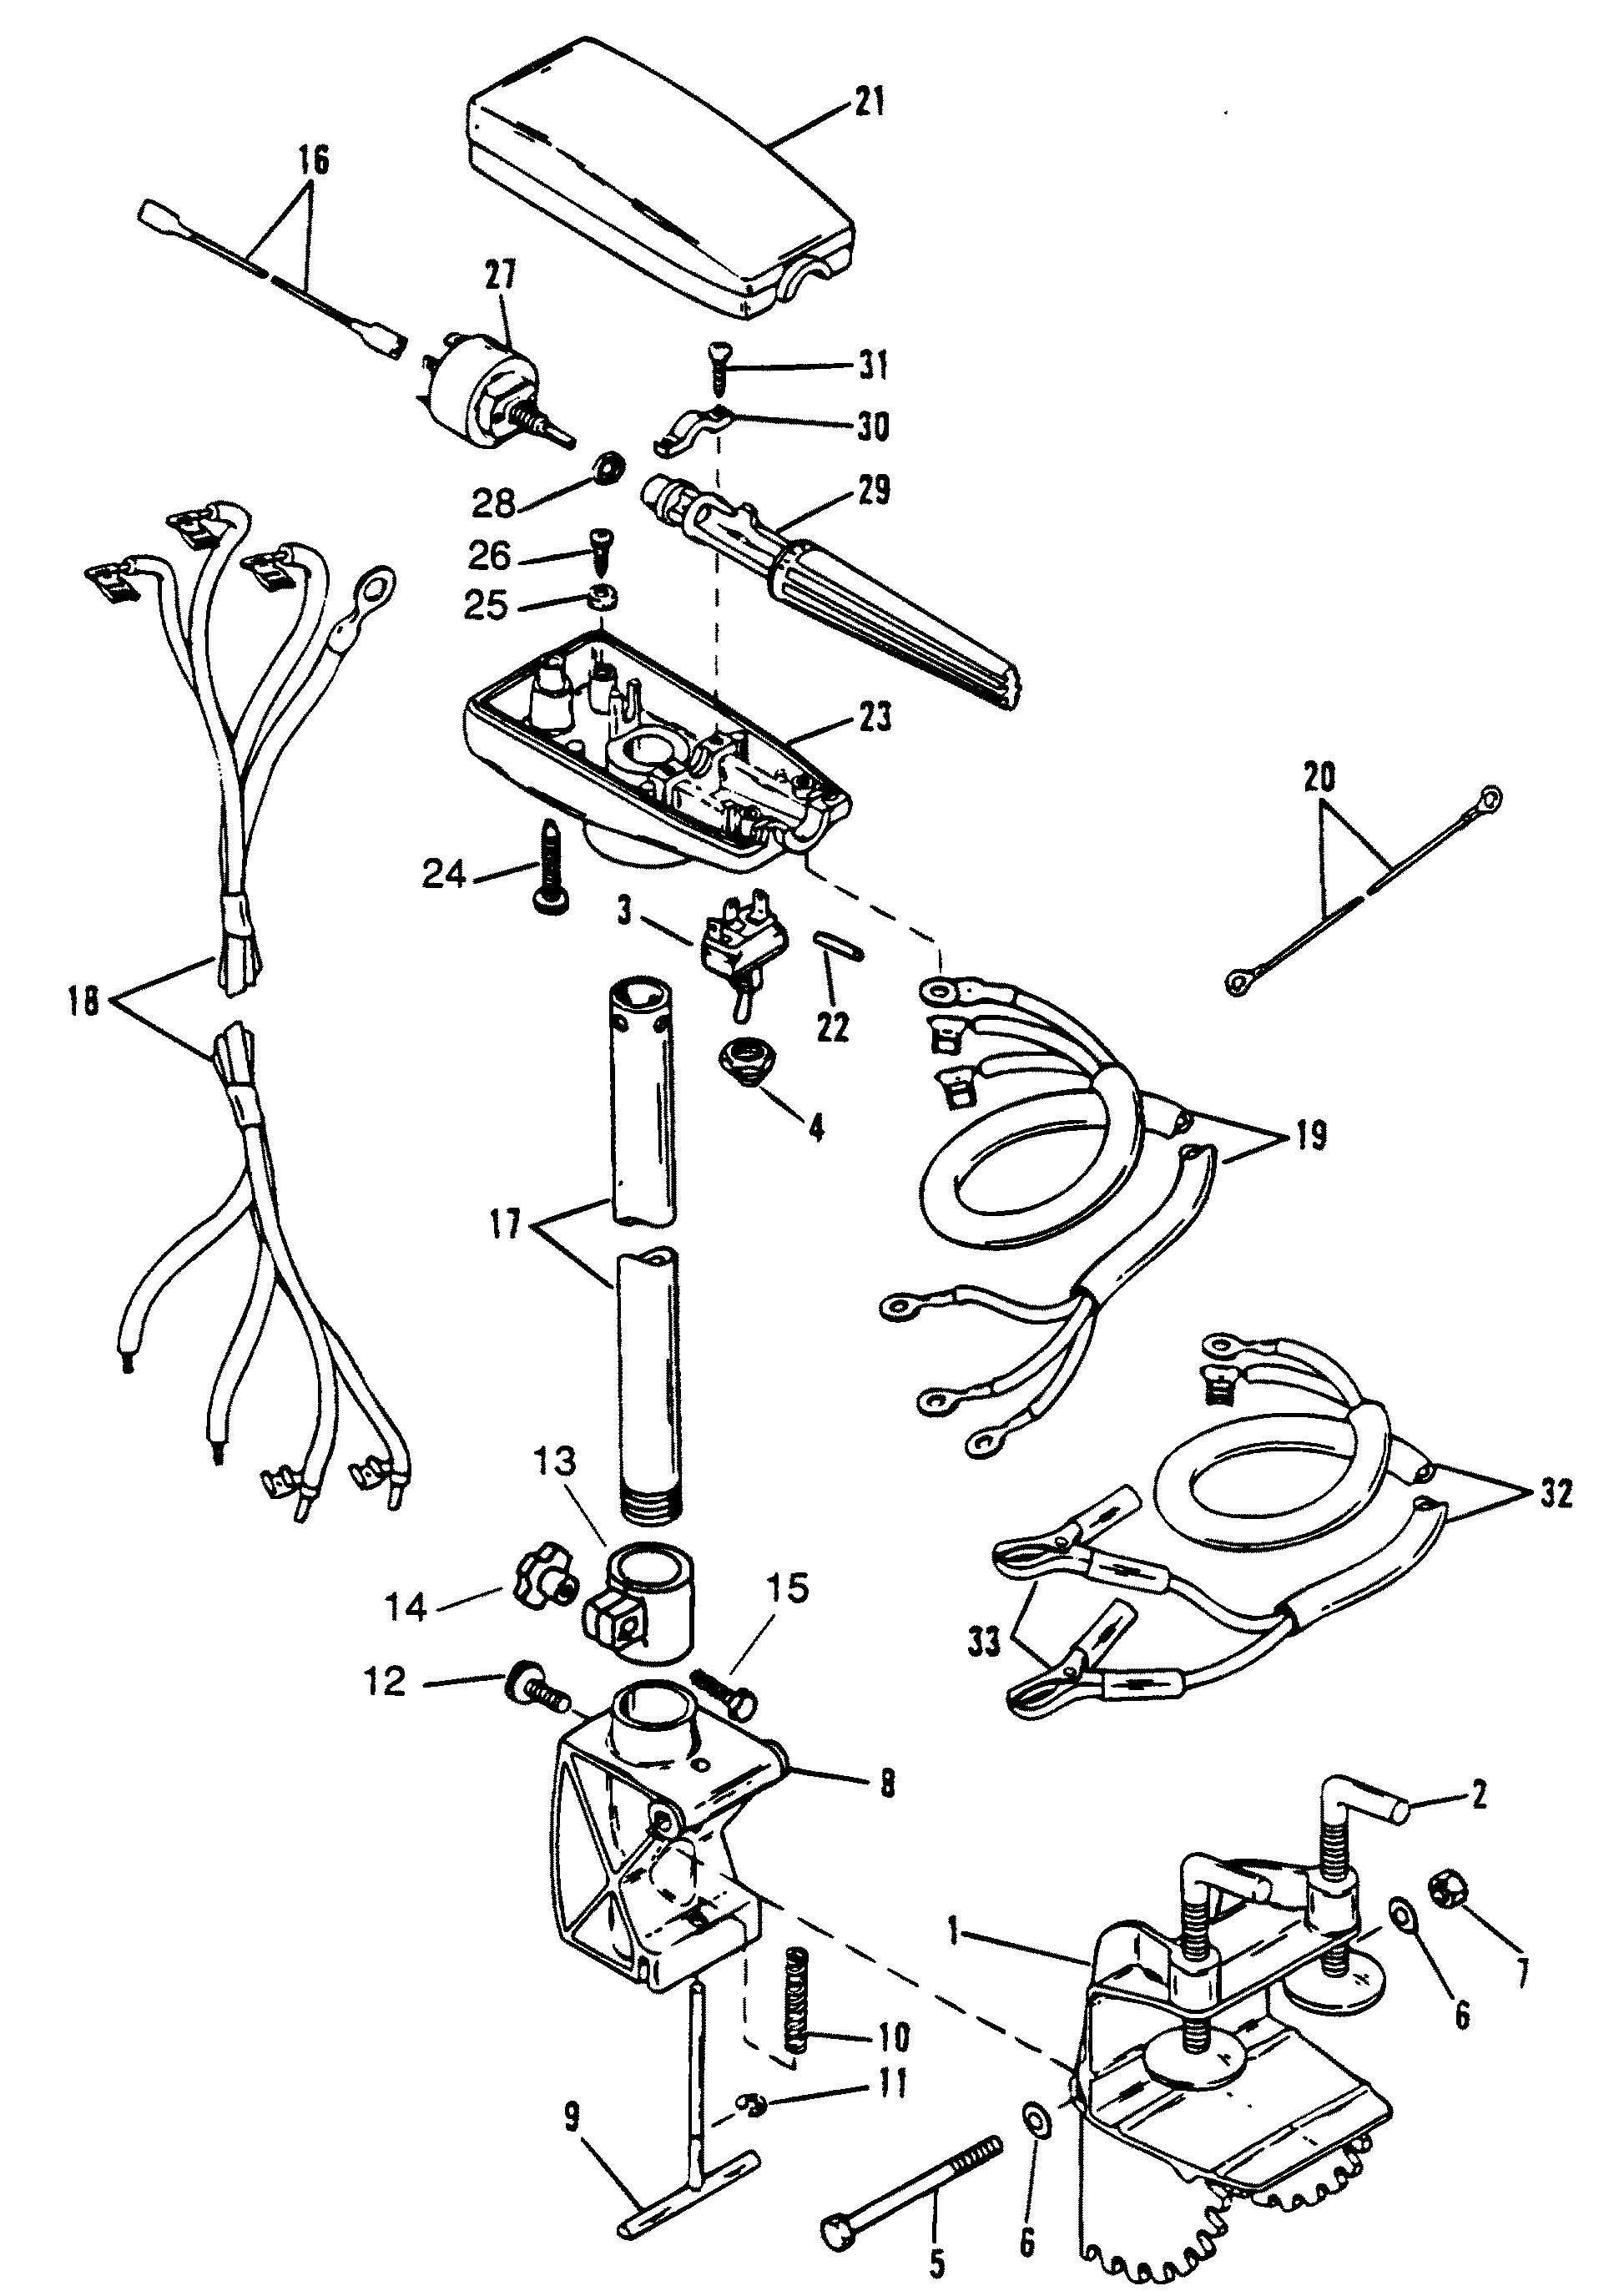 Motorguide Trolling Motor Wiring Diagram Real Brute Drive Shaft And Control Housing Tm For Mariner Mercury Plug